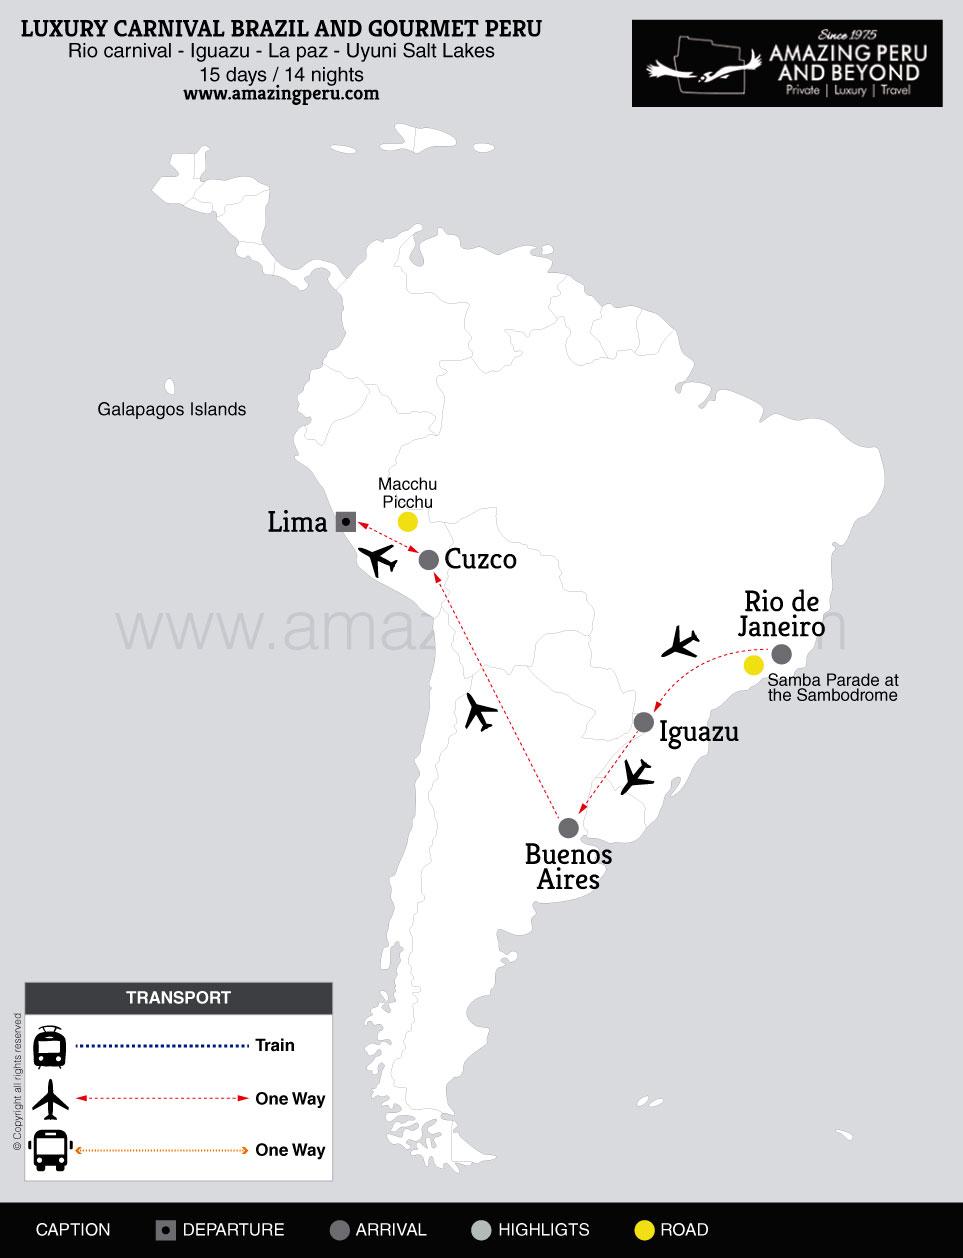 2019 Luxury Carnival Brazil And Gourmet Peru